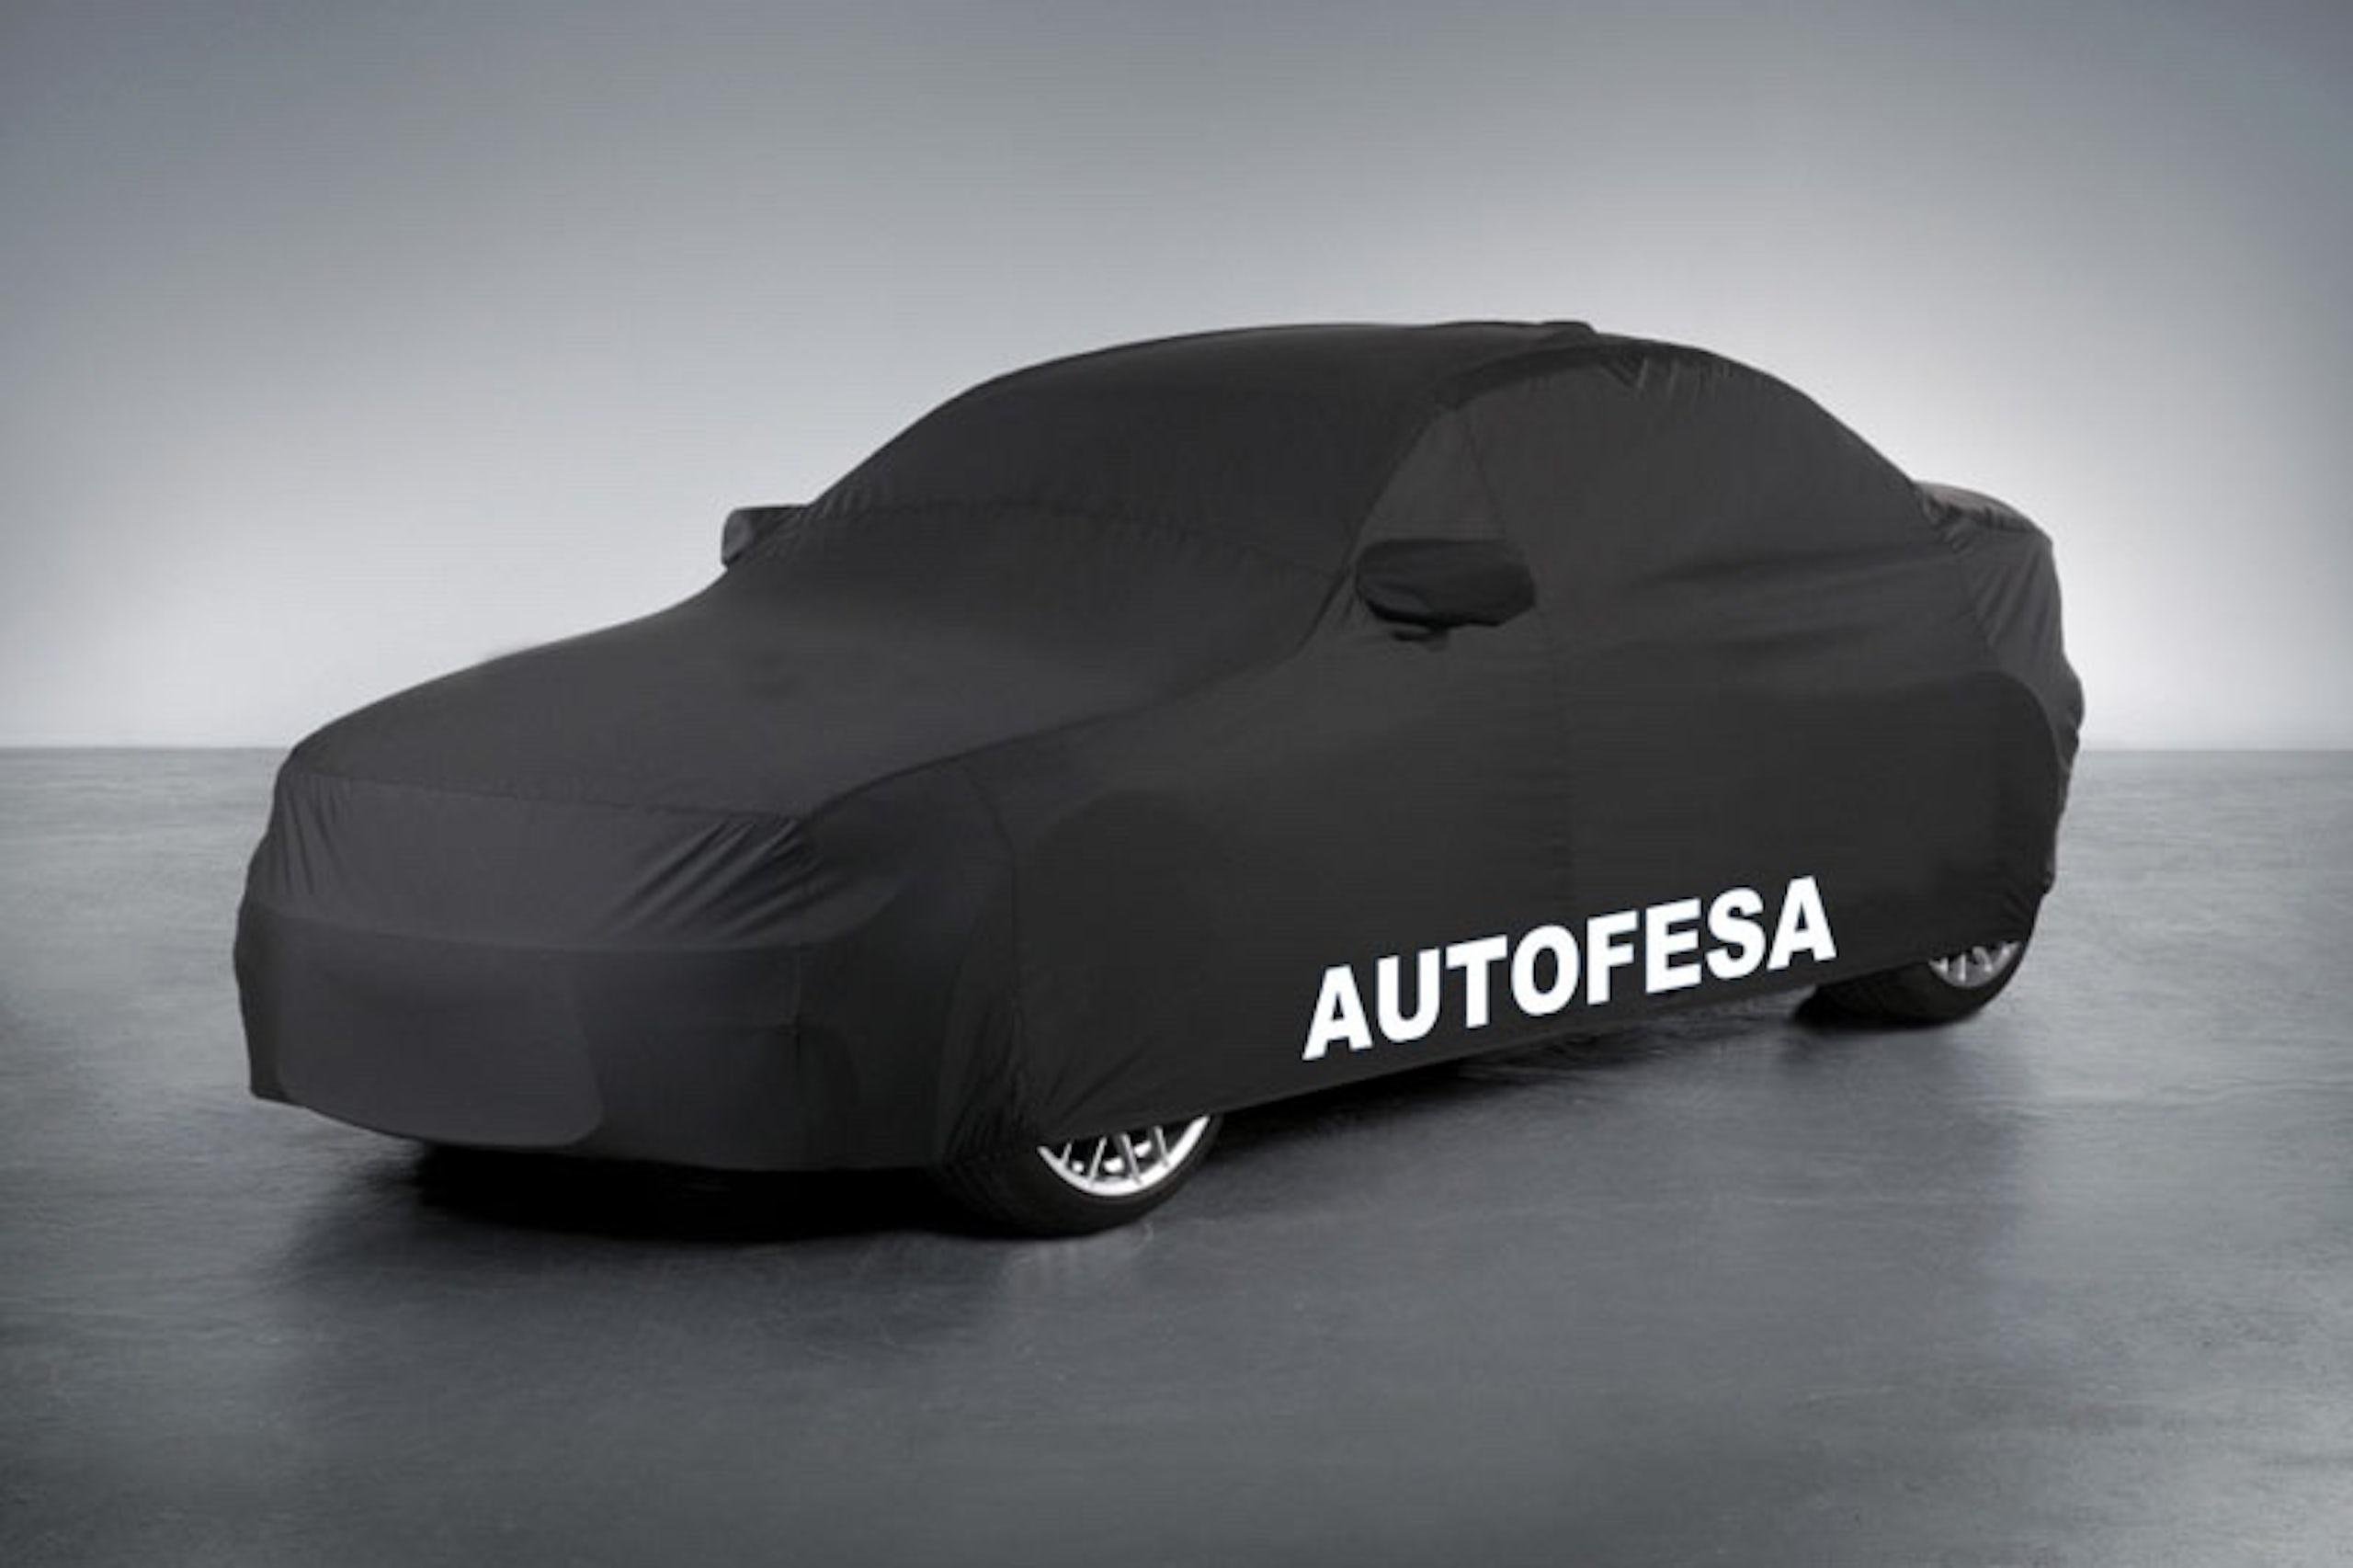 Audi A6 A6 3.0 TDI AVANT 204cv quattro 5p S tronic Auto S/S - Foto 48